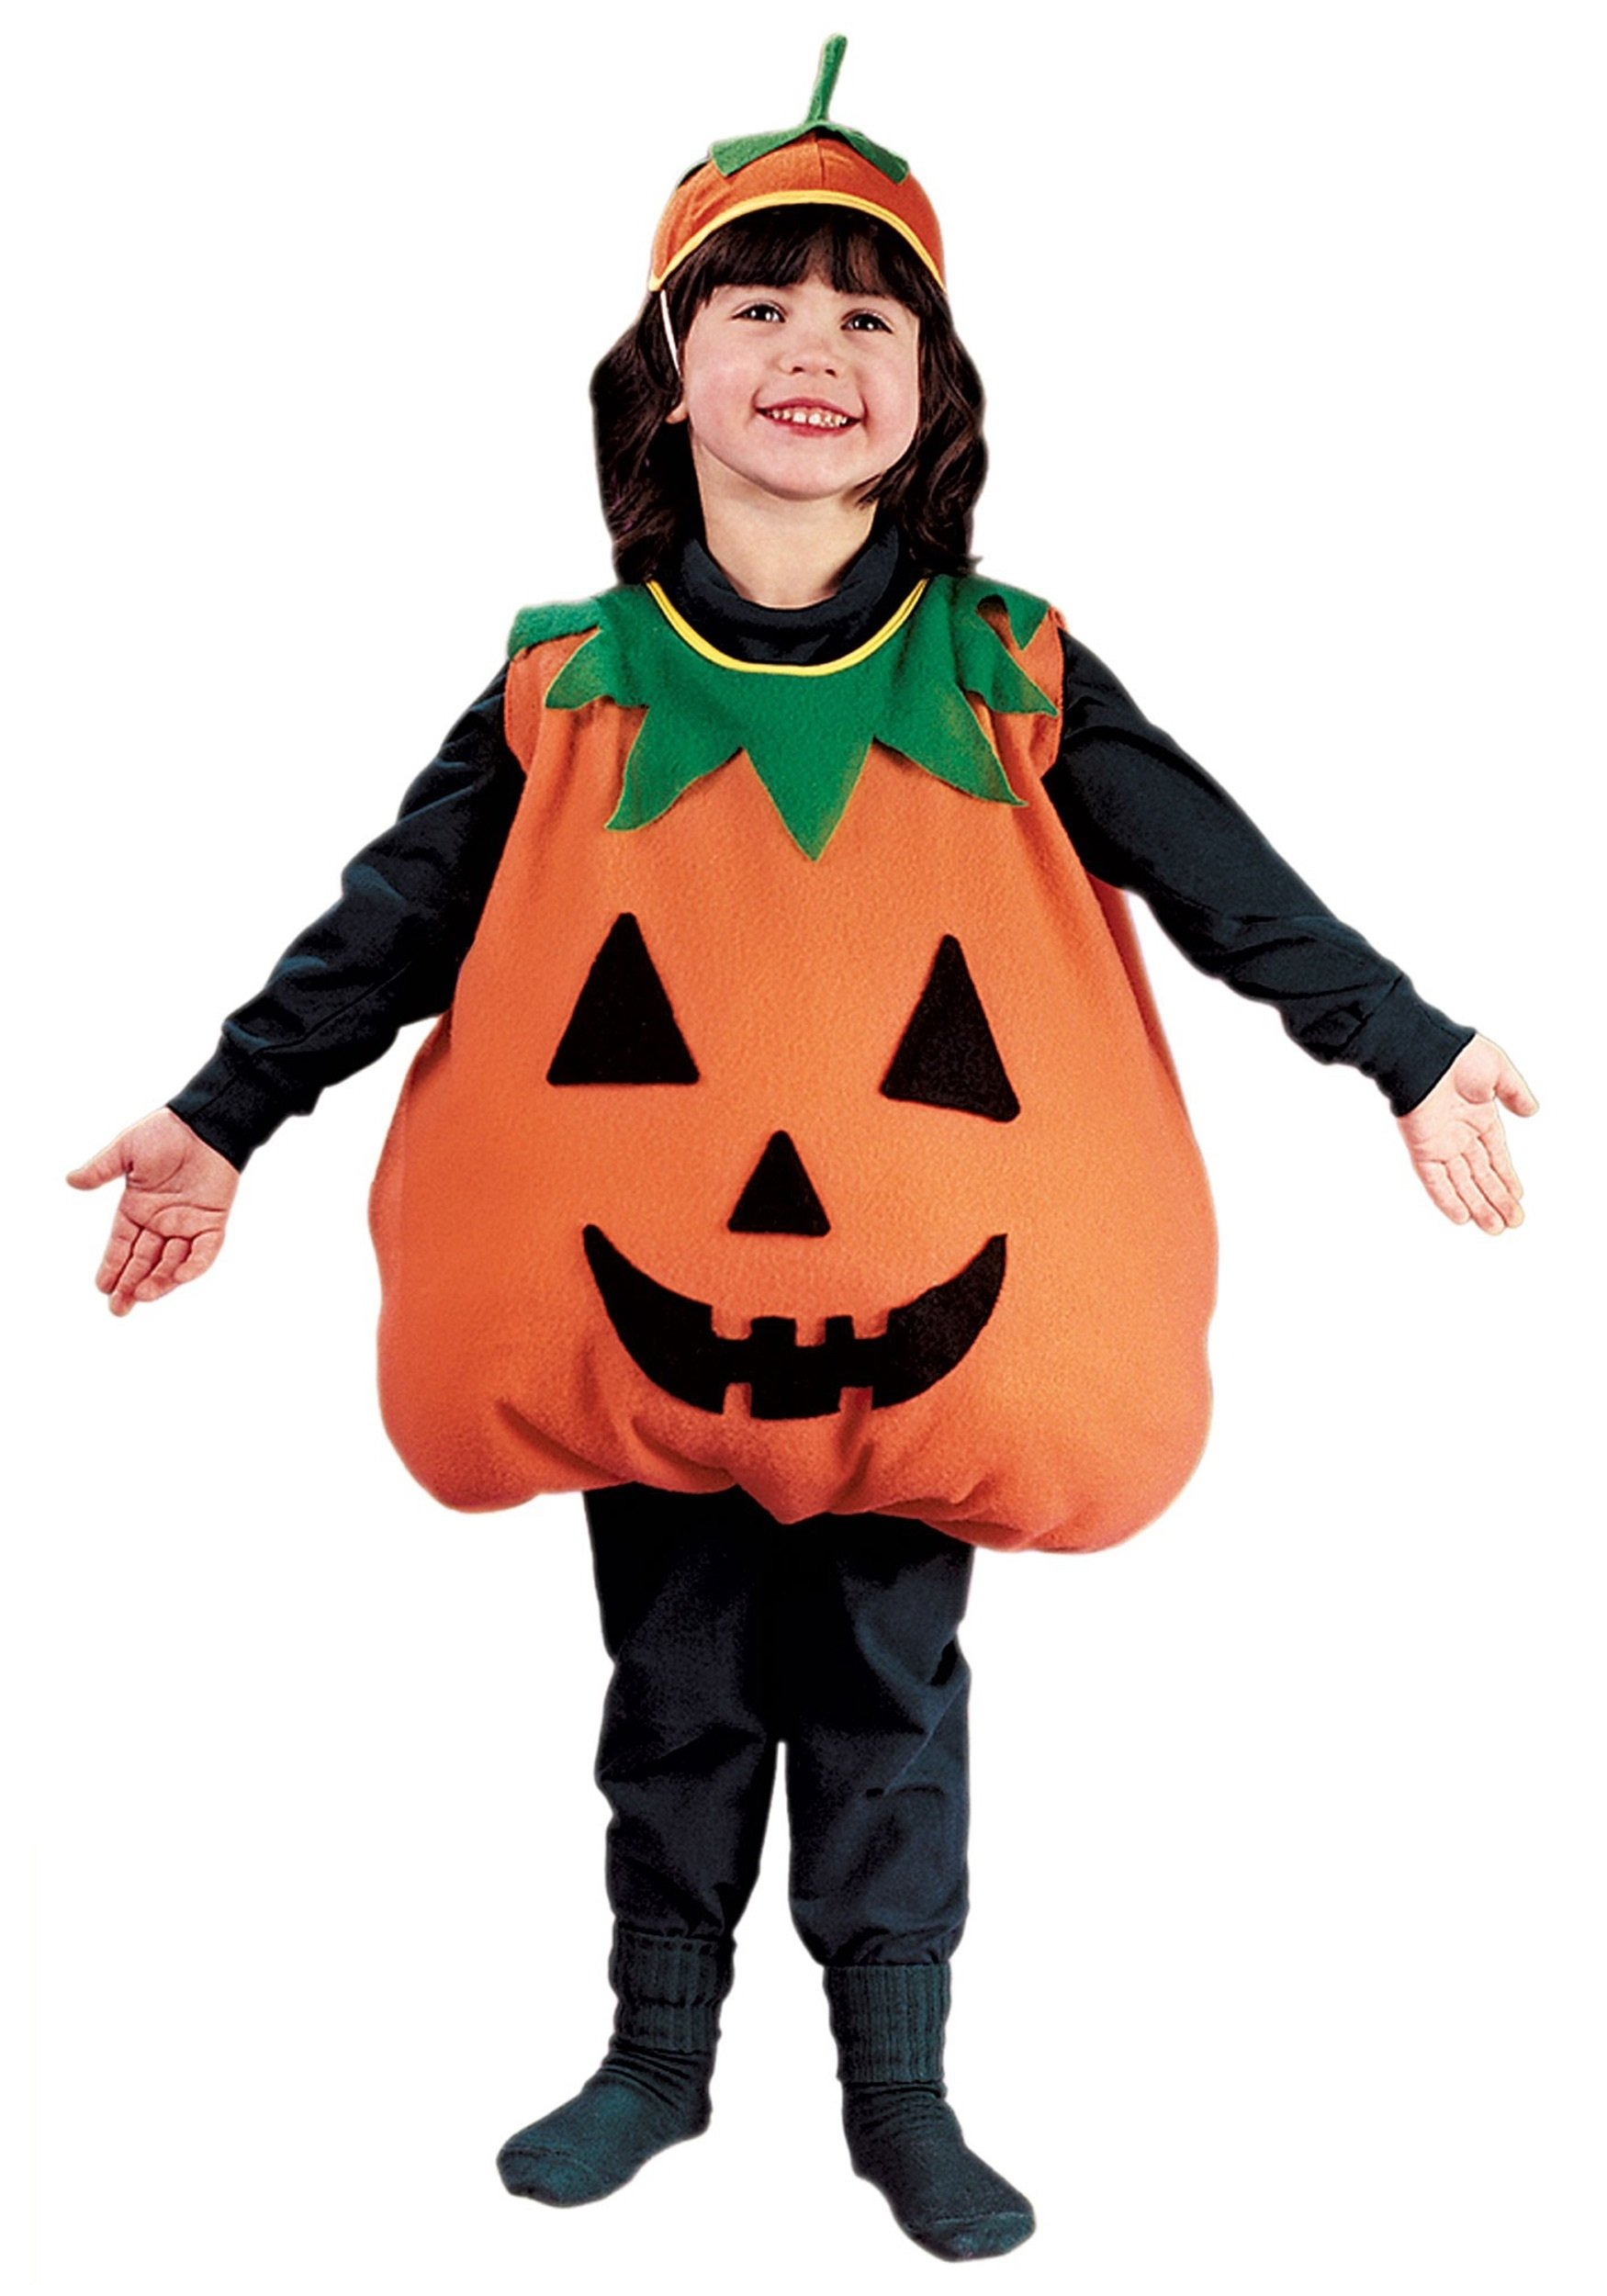 10 Ideal Halloween Costumes For Kids Ideas child pumpkin costume 2021